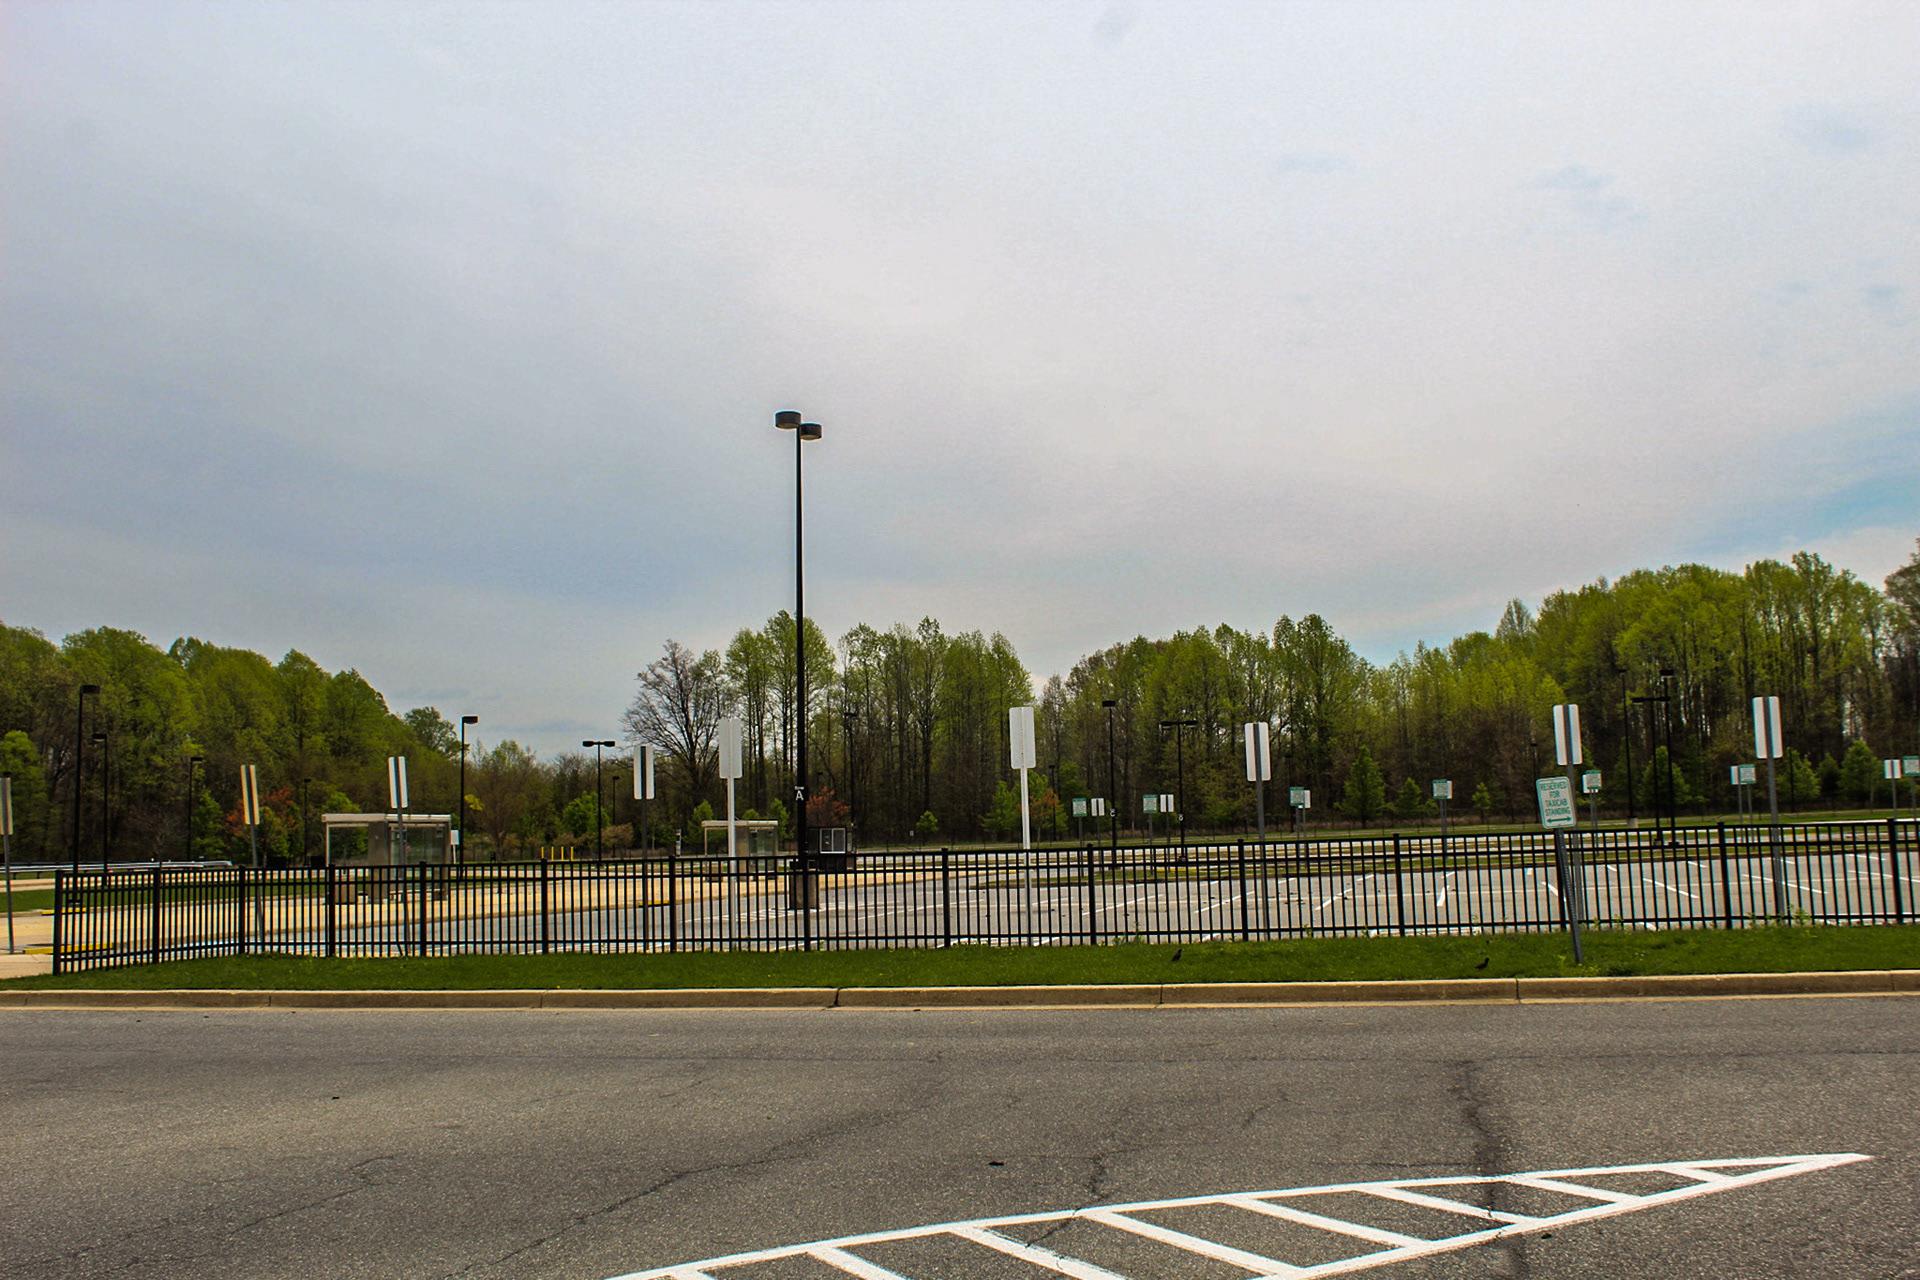 Deserted Parking Lot at Morgan Metro Station - April 6